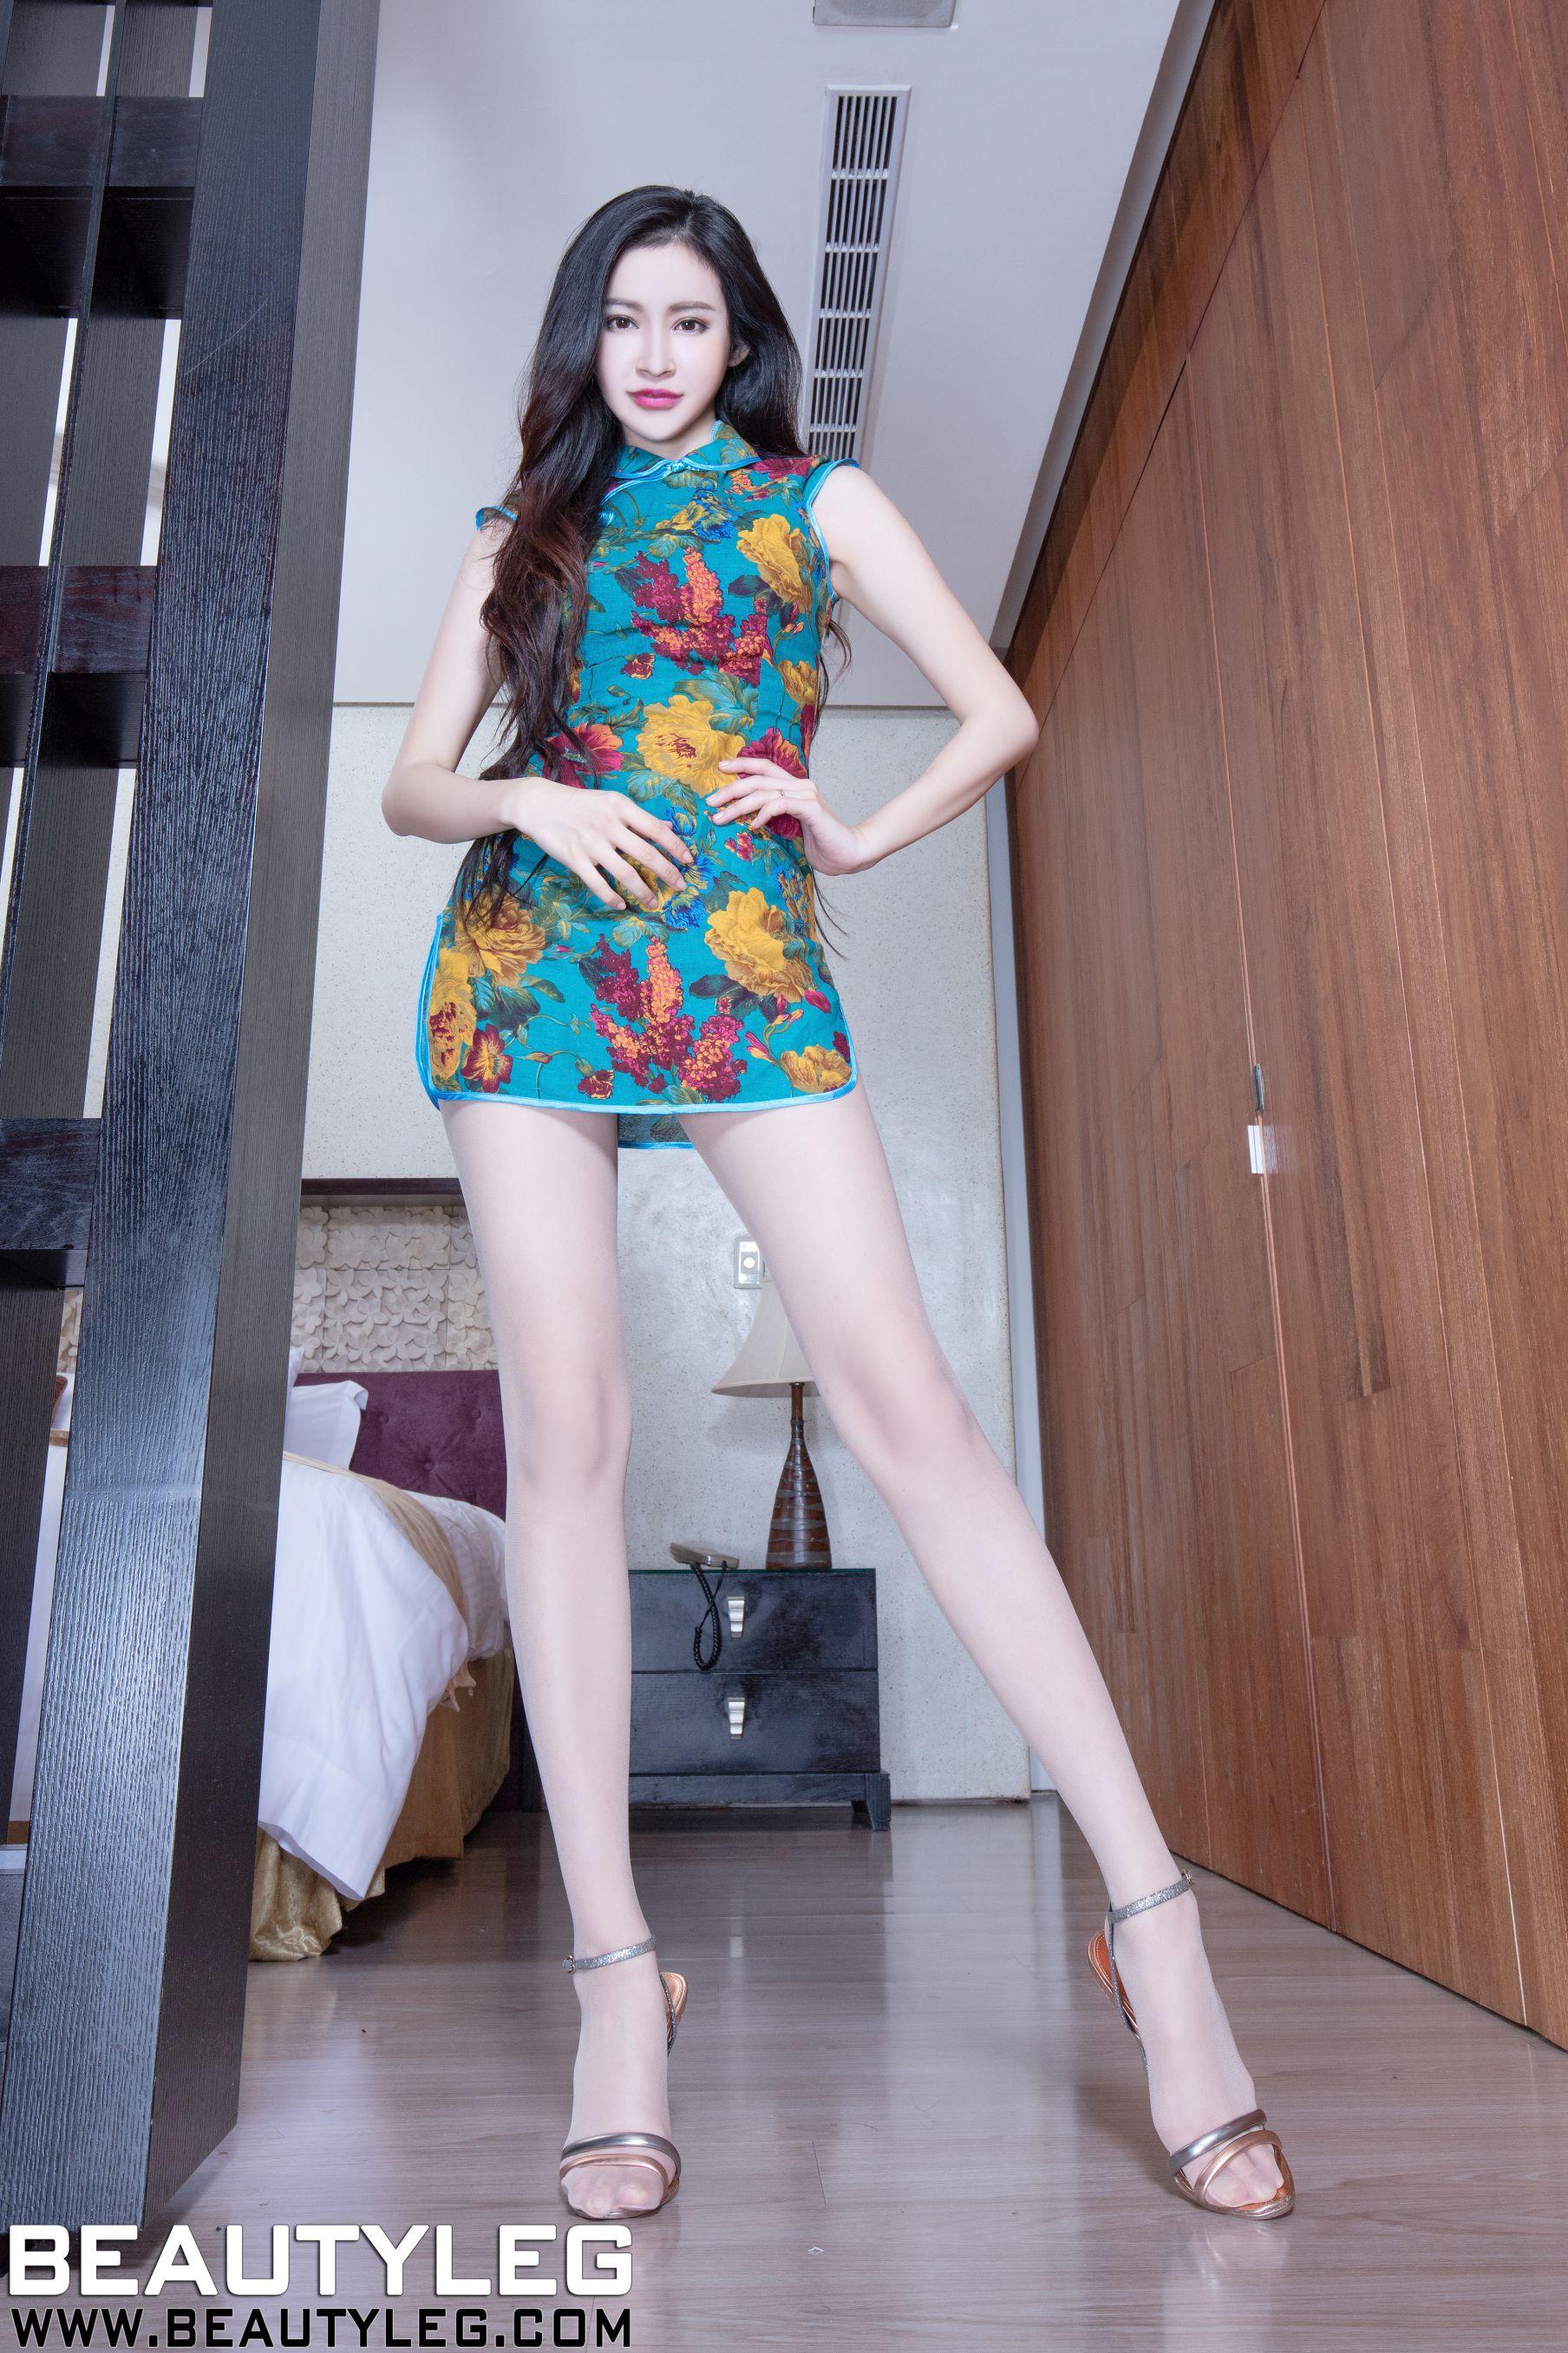 VOL.1293 [Beautyleg]肉丝袜高跟美腿:詹艾葳(腿模Avril,腿模Arvil)高品质写真套图(66P)